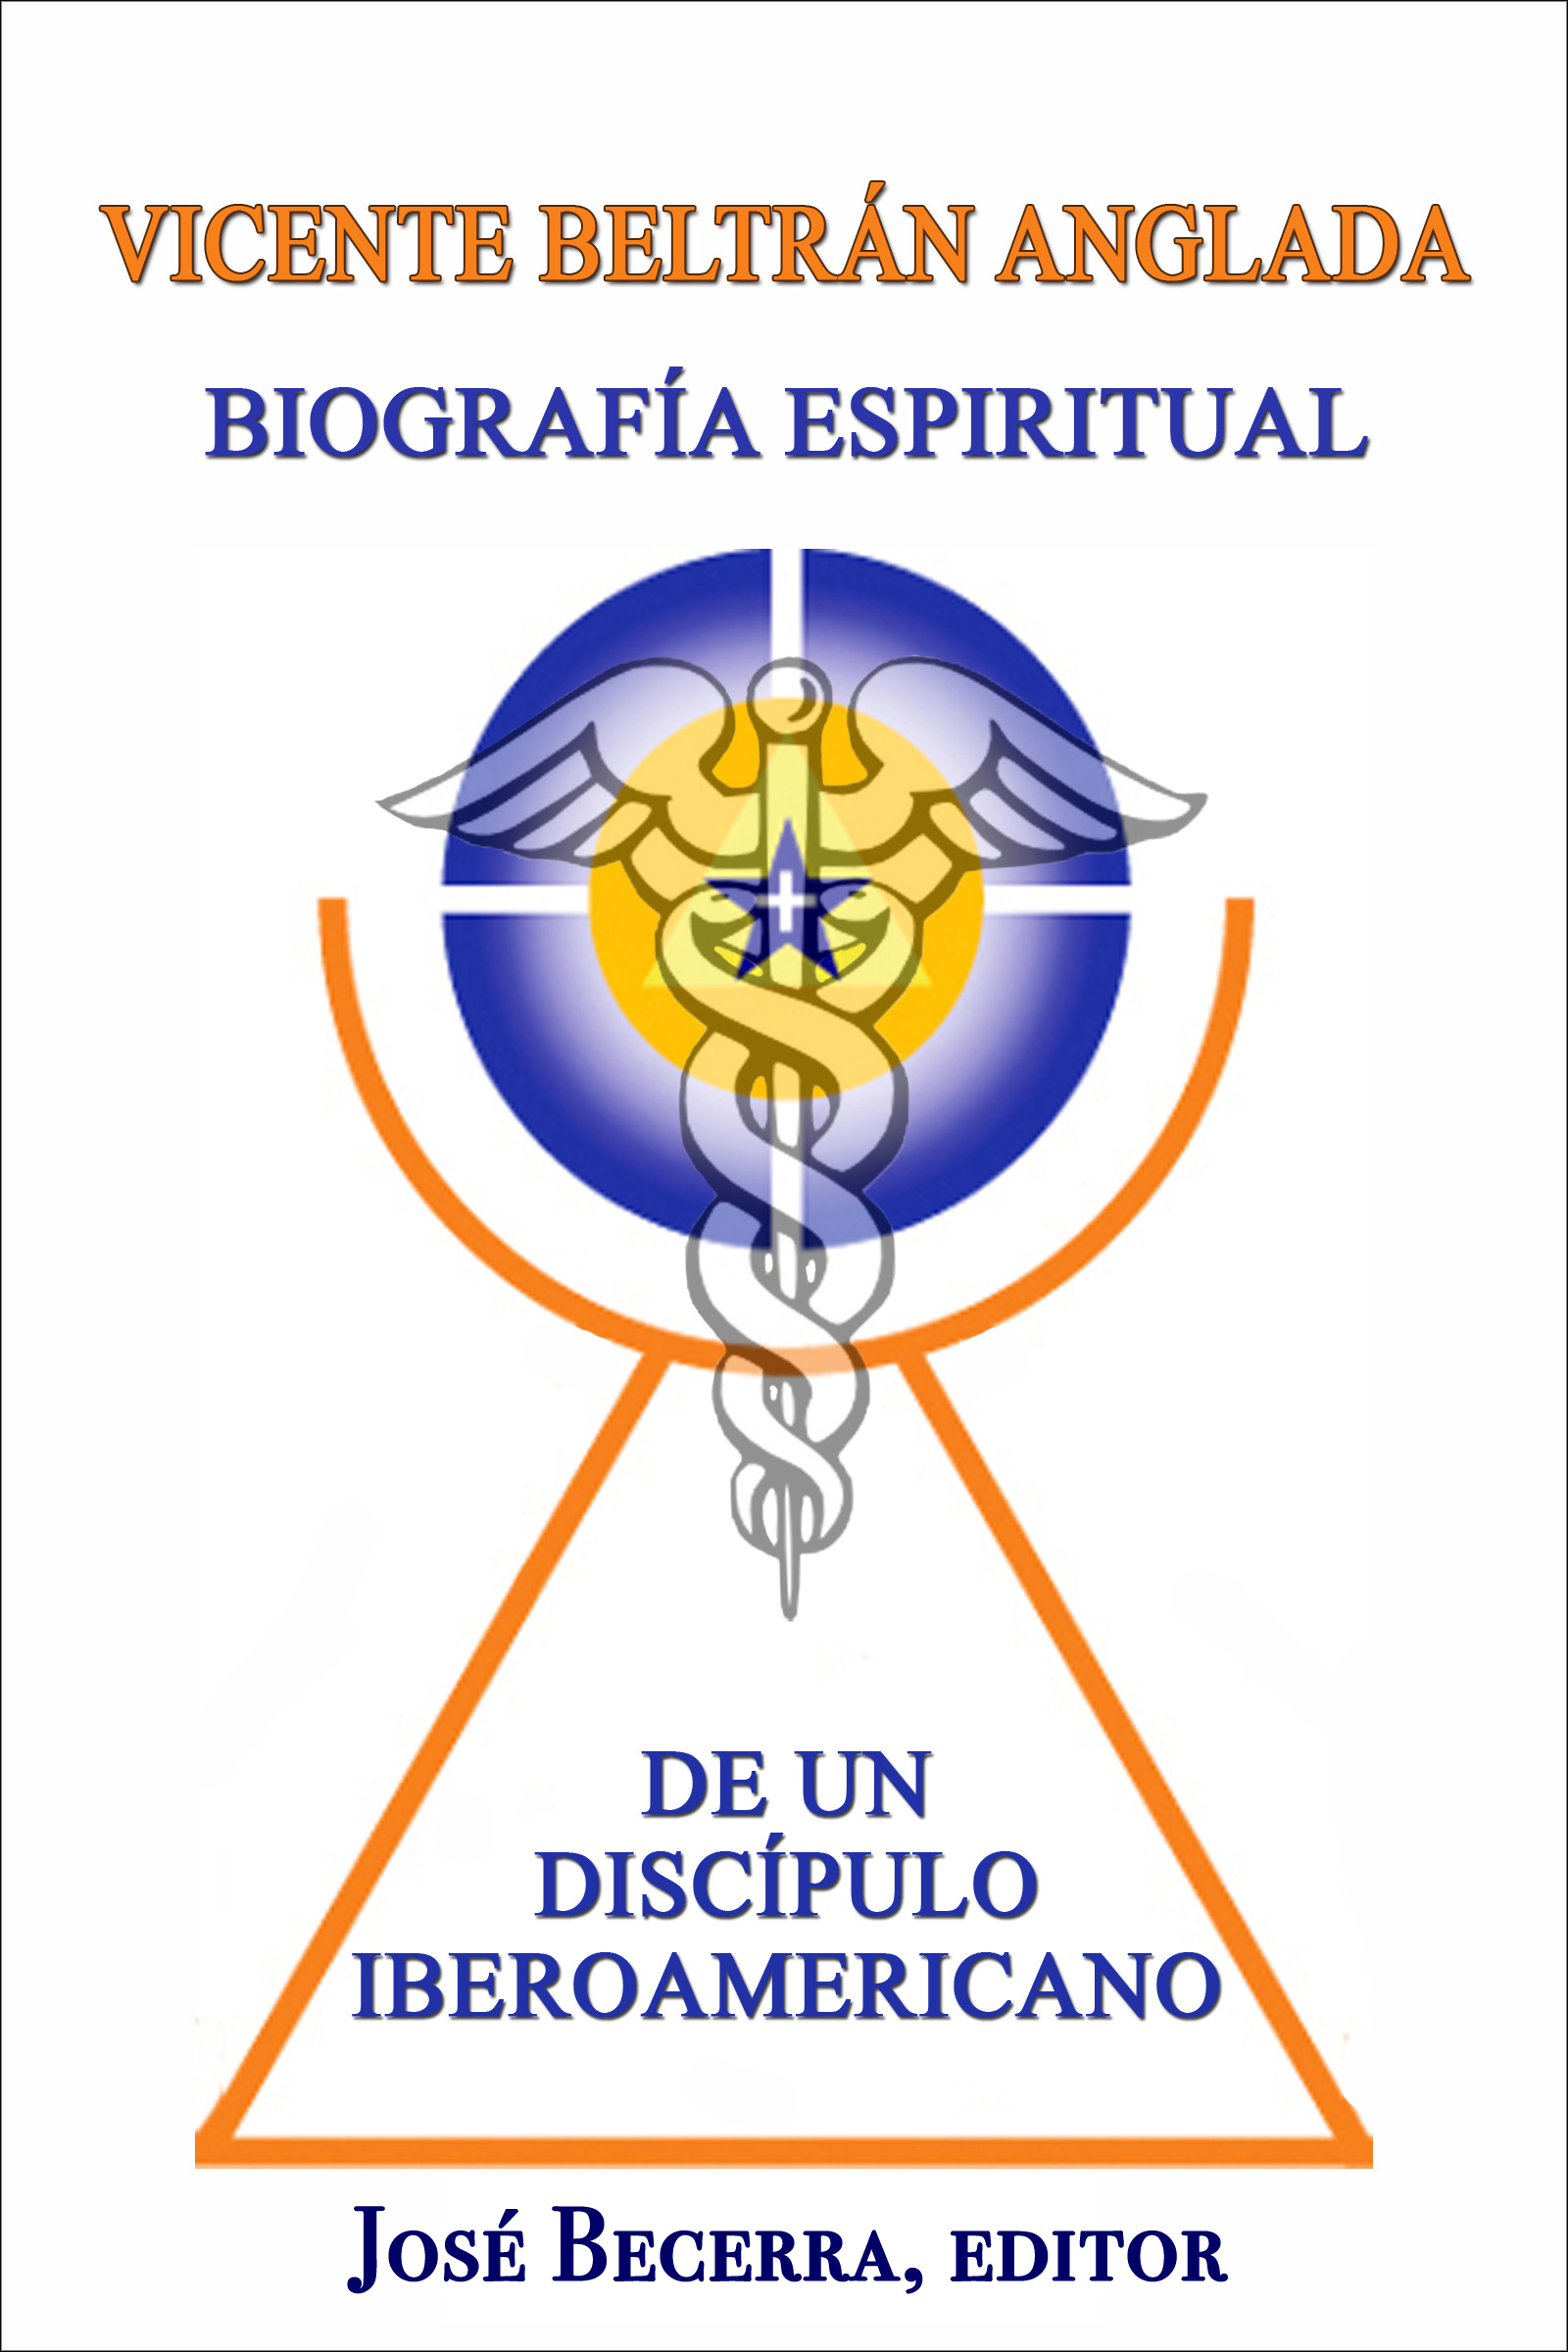 Biografía Espiritual de un Discípulo Iberoamericano